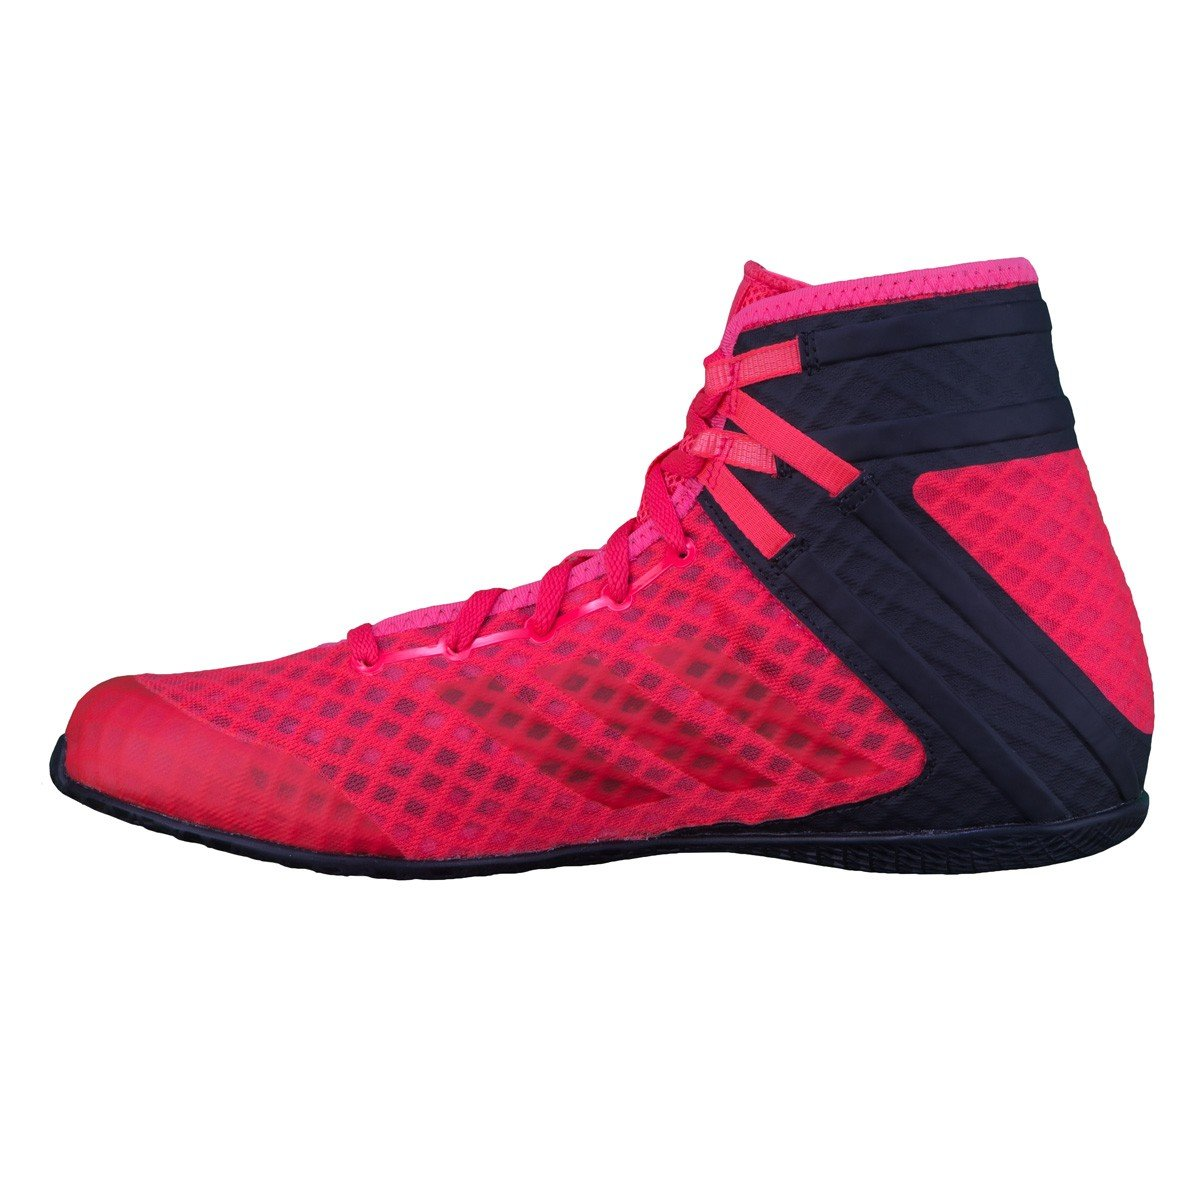 Rouge adidas Speedex 16.1, Chaussures de Boxe Homme 46 EU